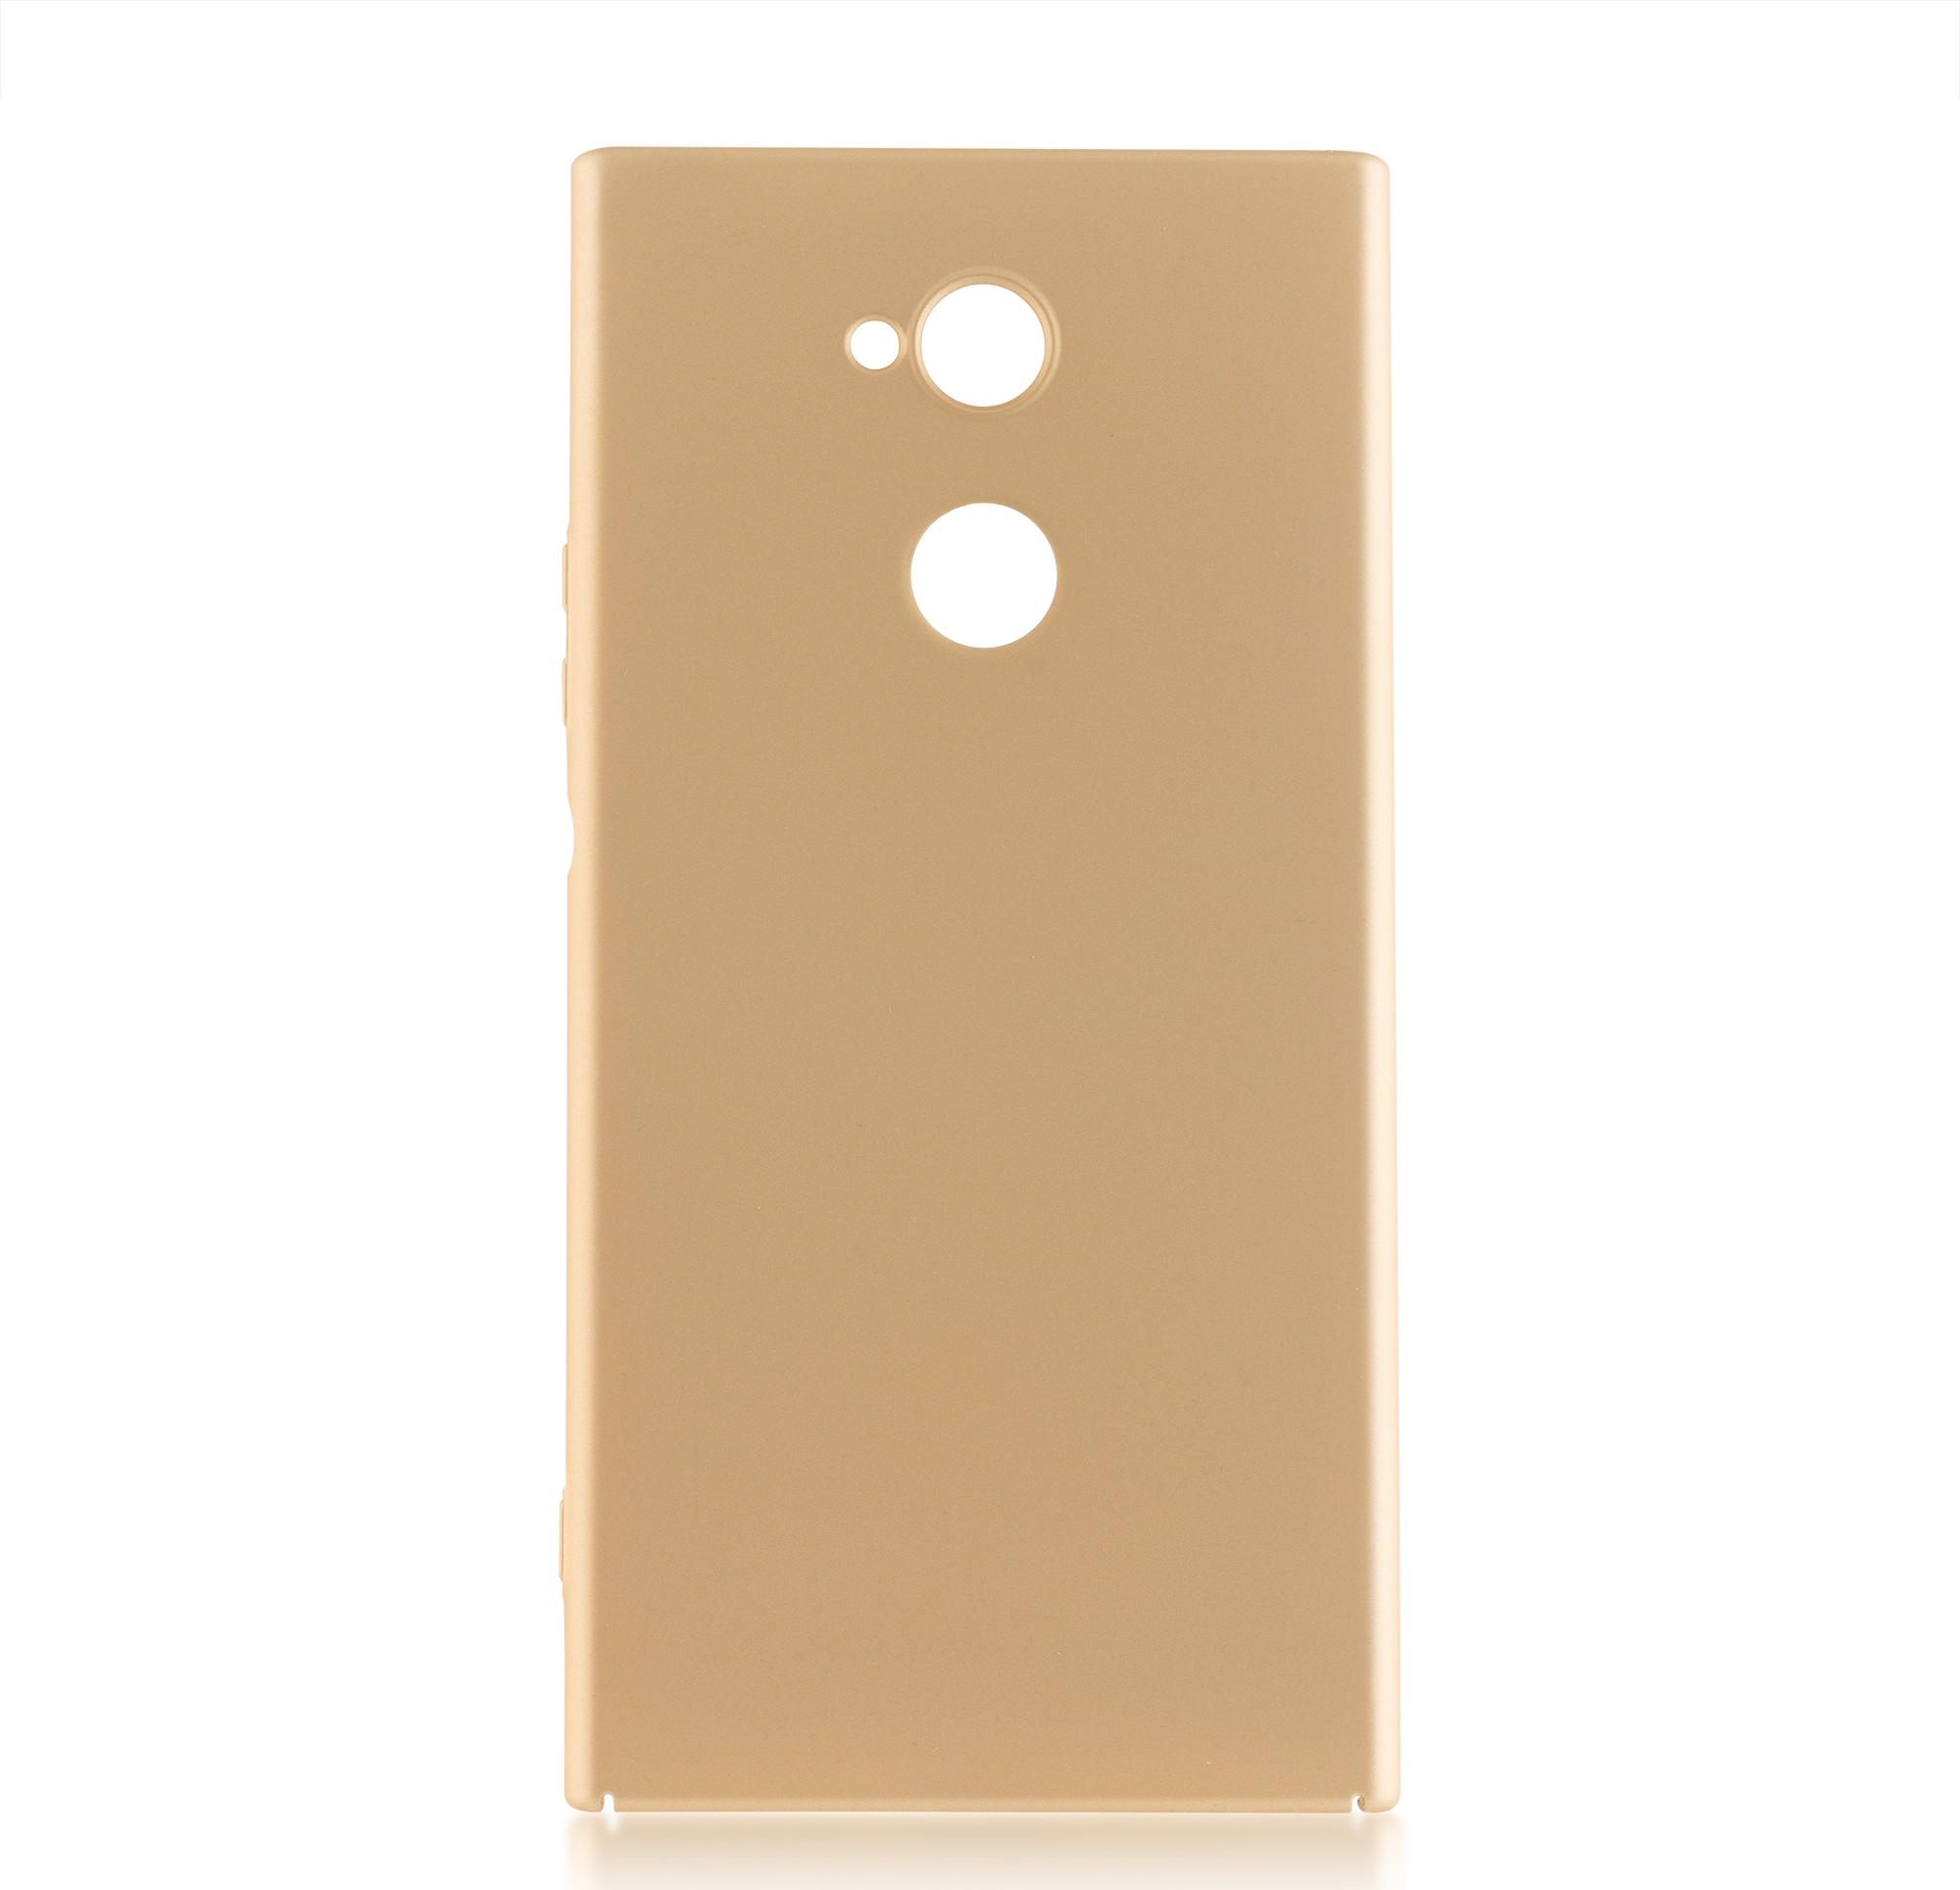 Чехол Brosco 4Side Soft-Touch для Sony Xperia XA2 Ultra, золотой чехол для сотового телефона brosco для sony xa2 ultra xa2u book gold золотой